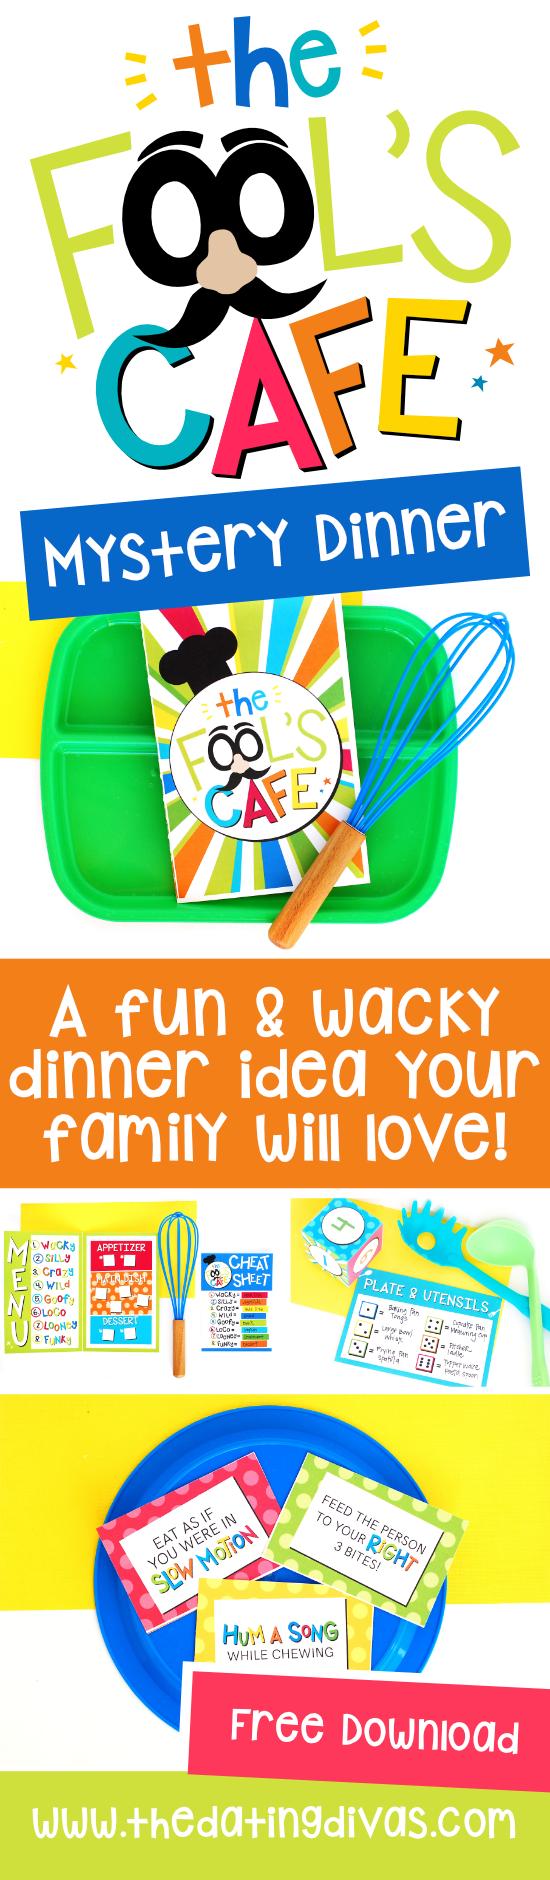 Fool's Cafe: A Fun Family Dinner Idea For April Fool's Day #AprilFoolsDay #FunFamilyDinnerIdea #FamilyDinnerGame